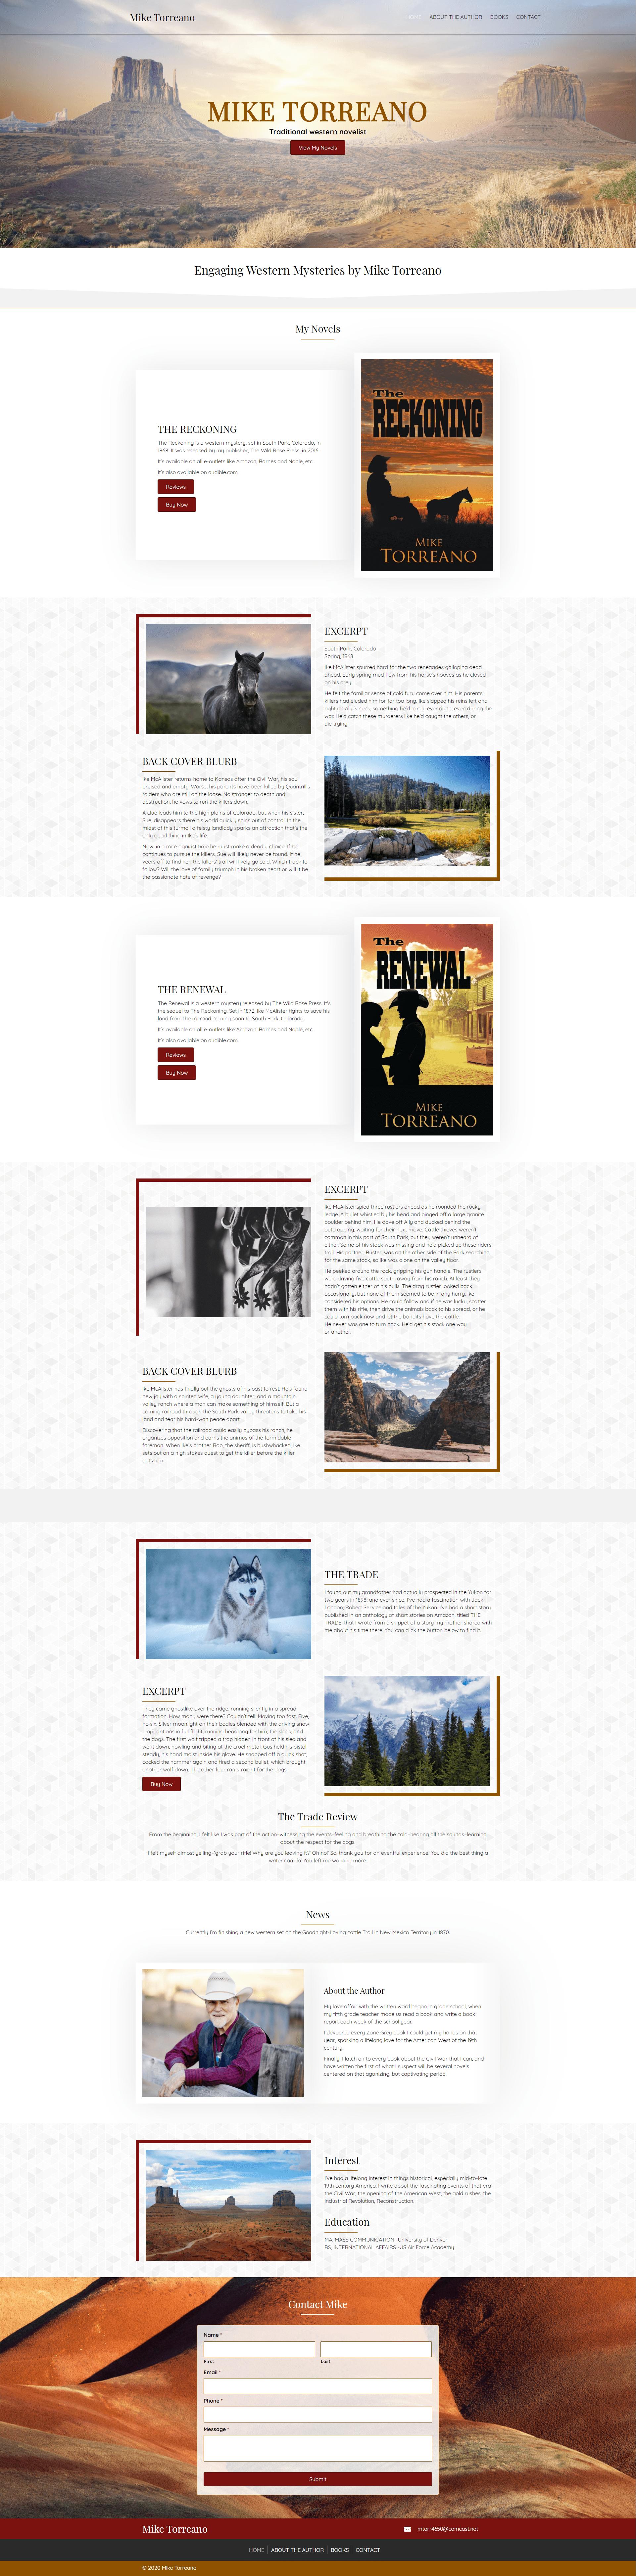 screencapture-miketorreano-desktop